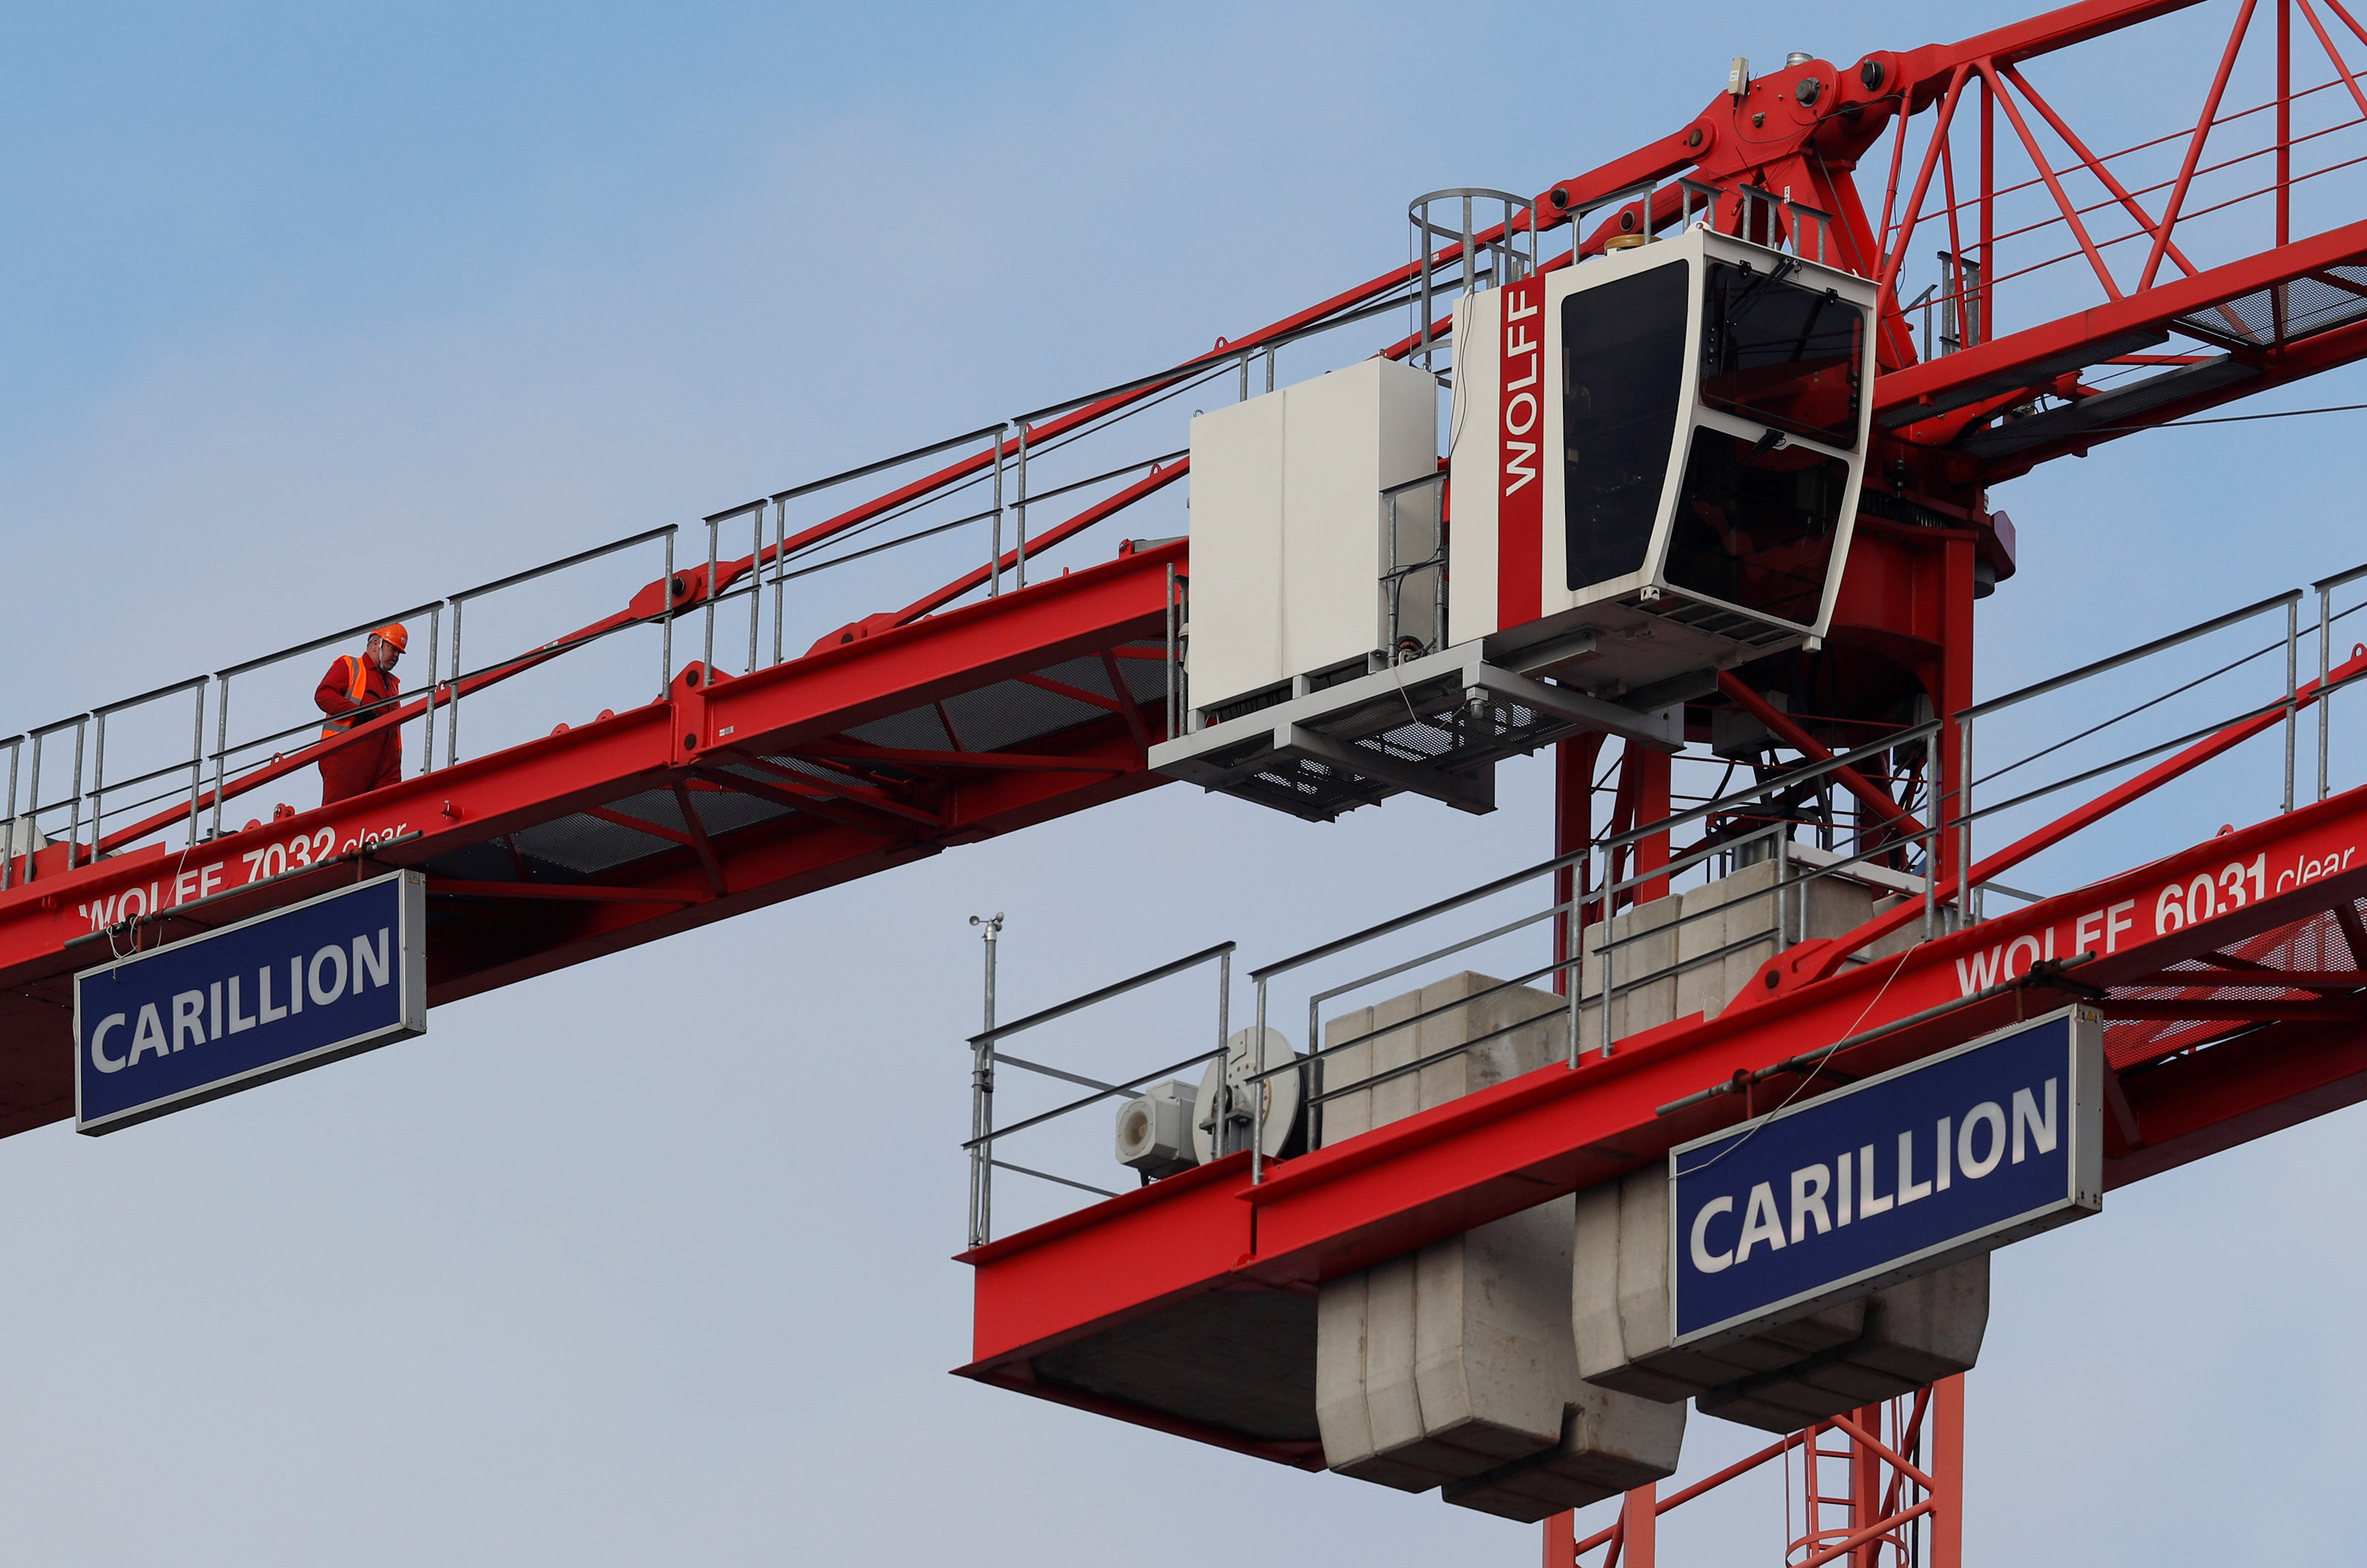 A worker walks along a crane on Carillion's Midland Metropolitan Hospital construction site in Smethwick, Britain January 29, 2018